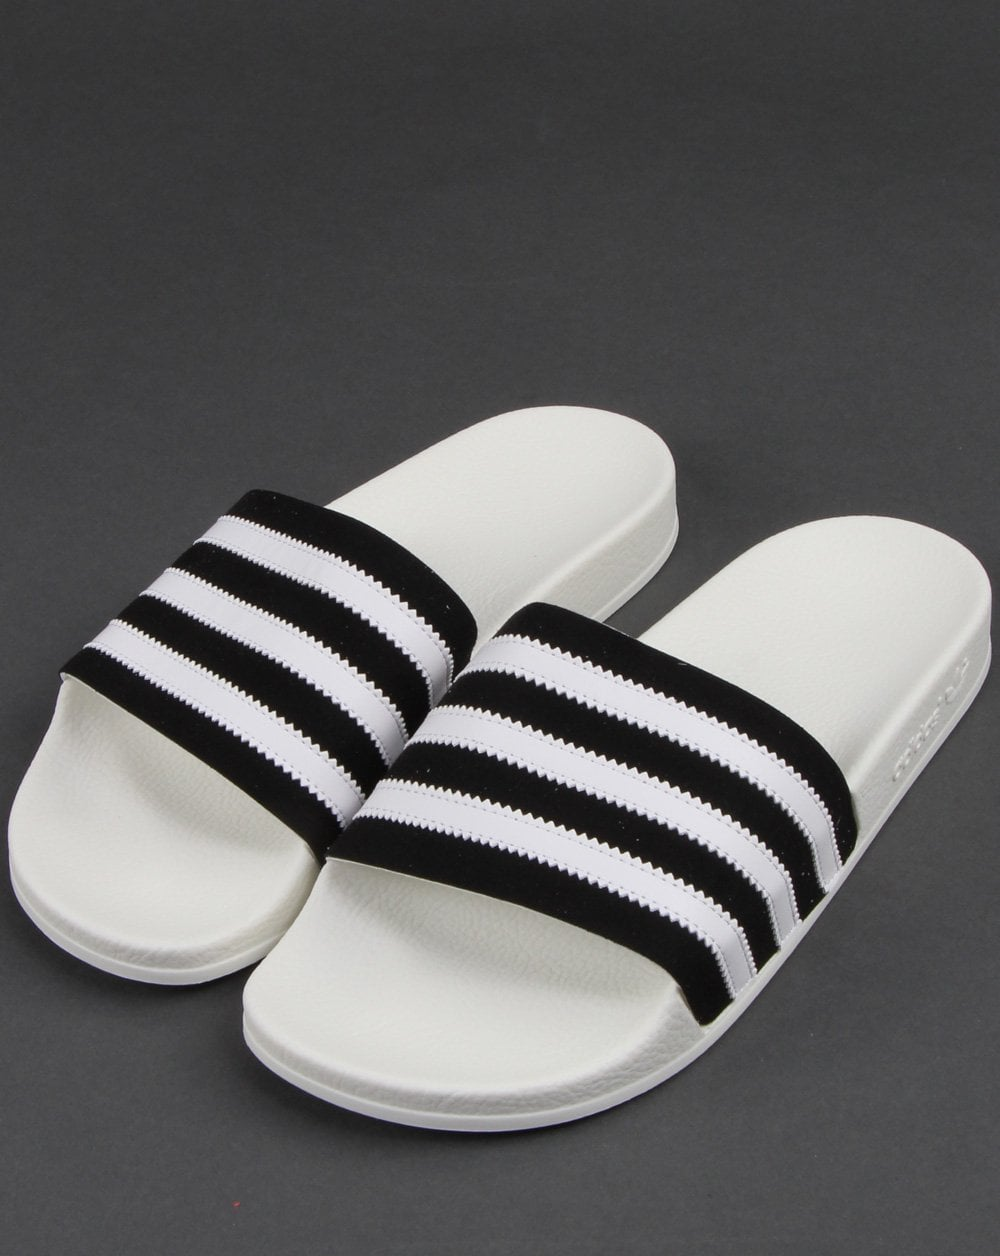 Adidas Adilette Slides Black White 80s Casual Classics